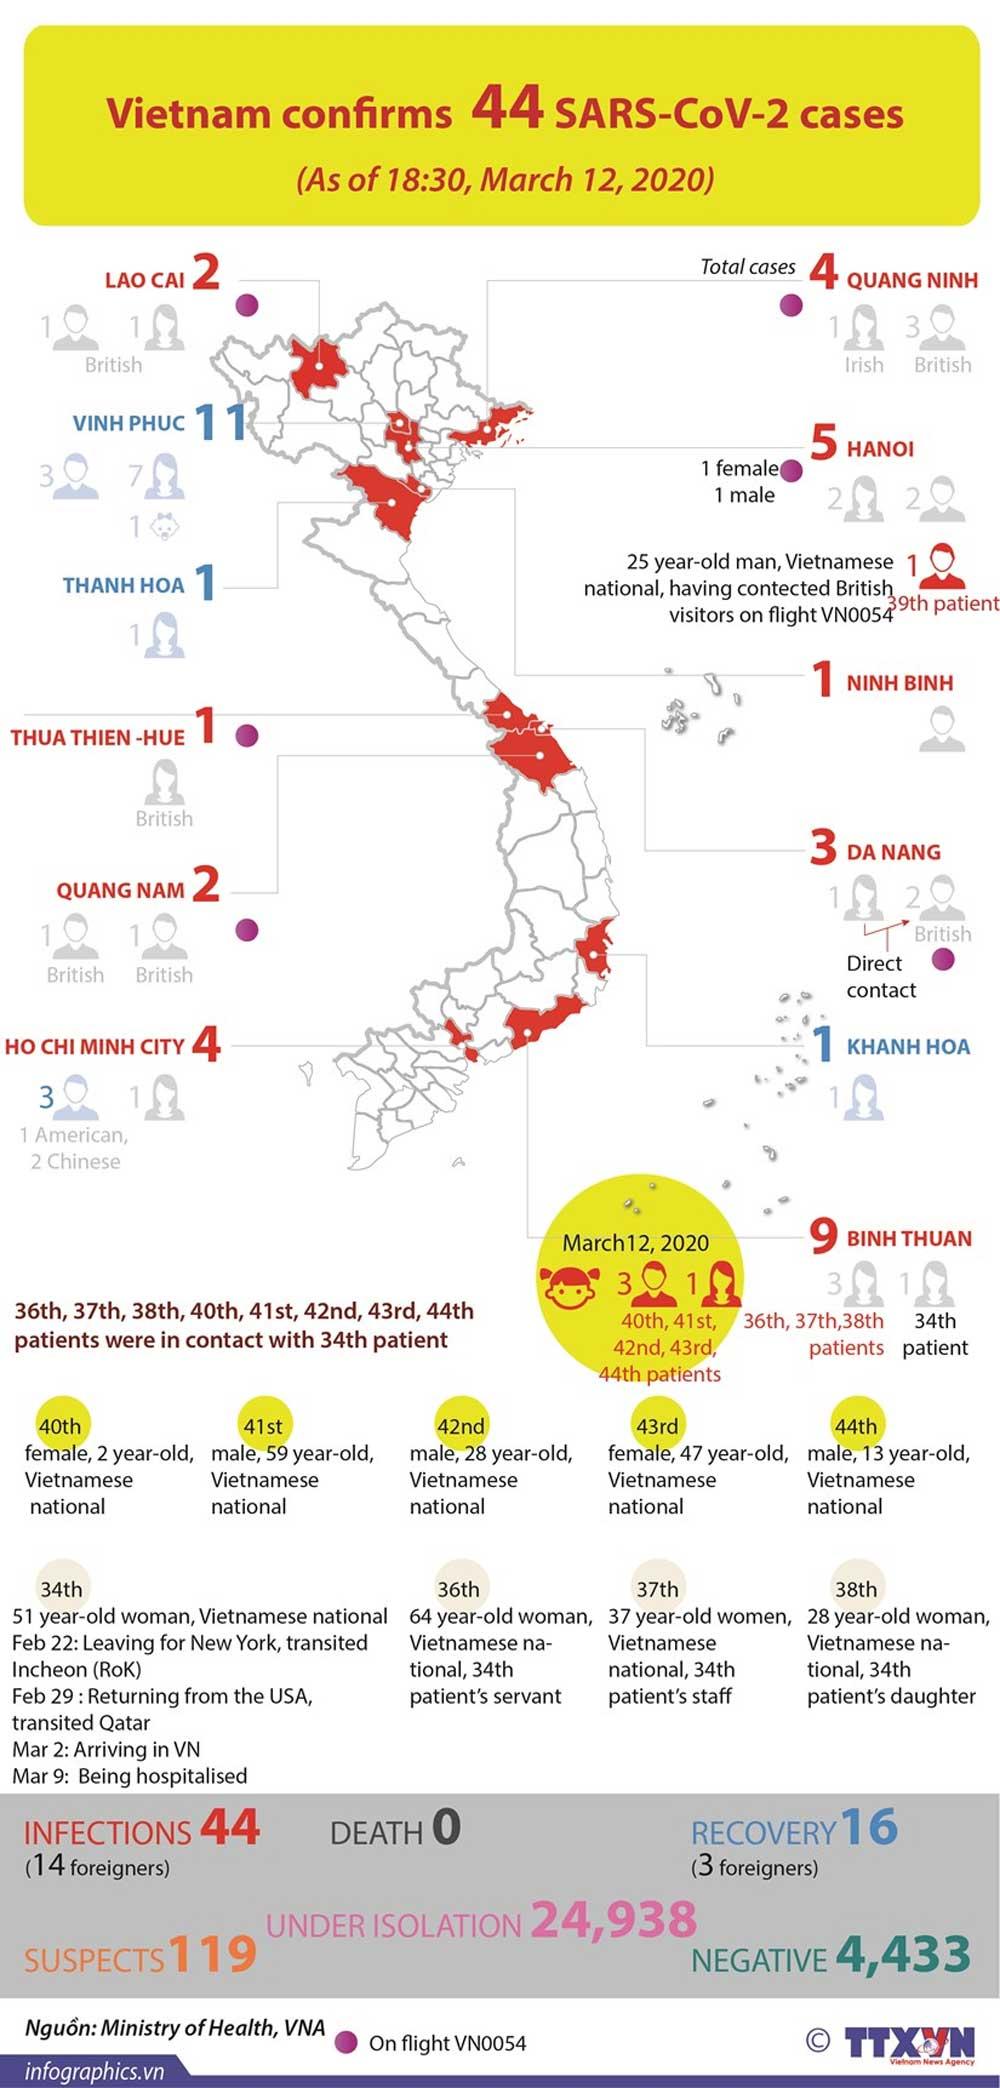 Vietnam, confirms, SARS-CoV-2 cases, Covid-19 case, infected patient